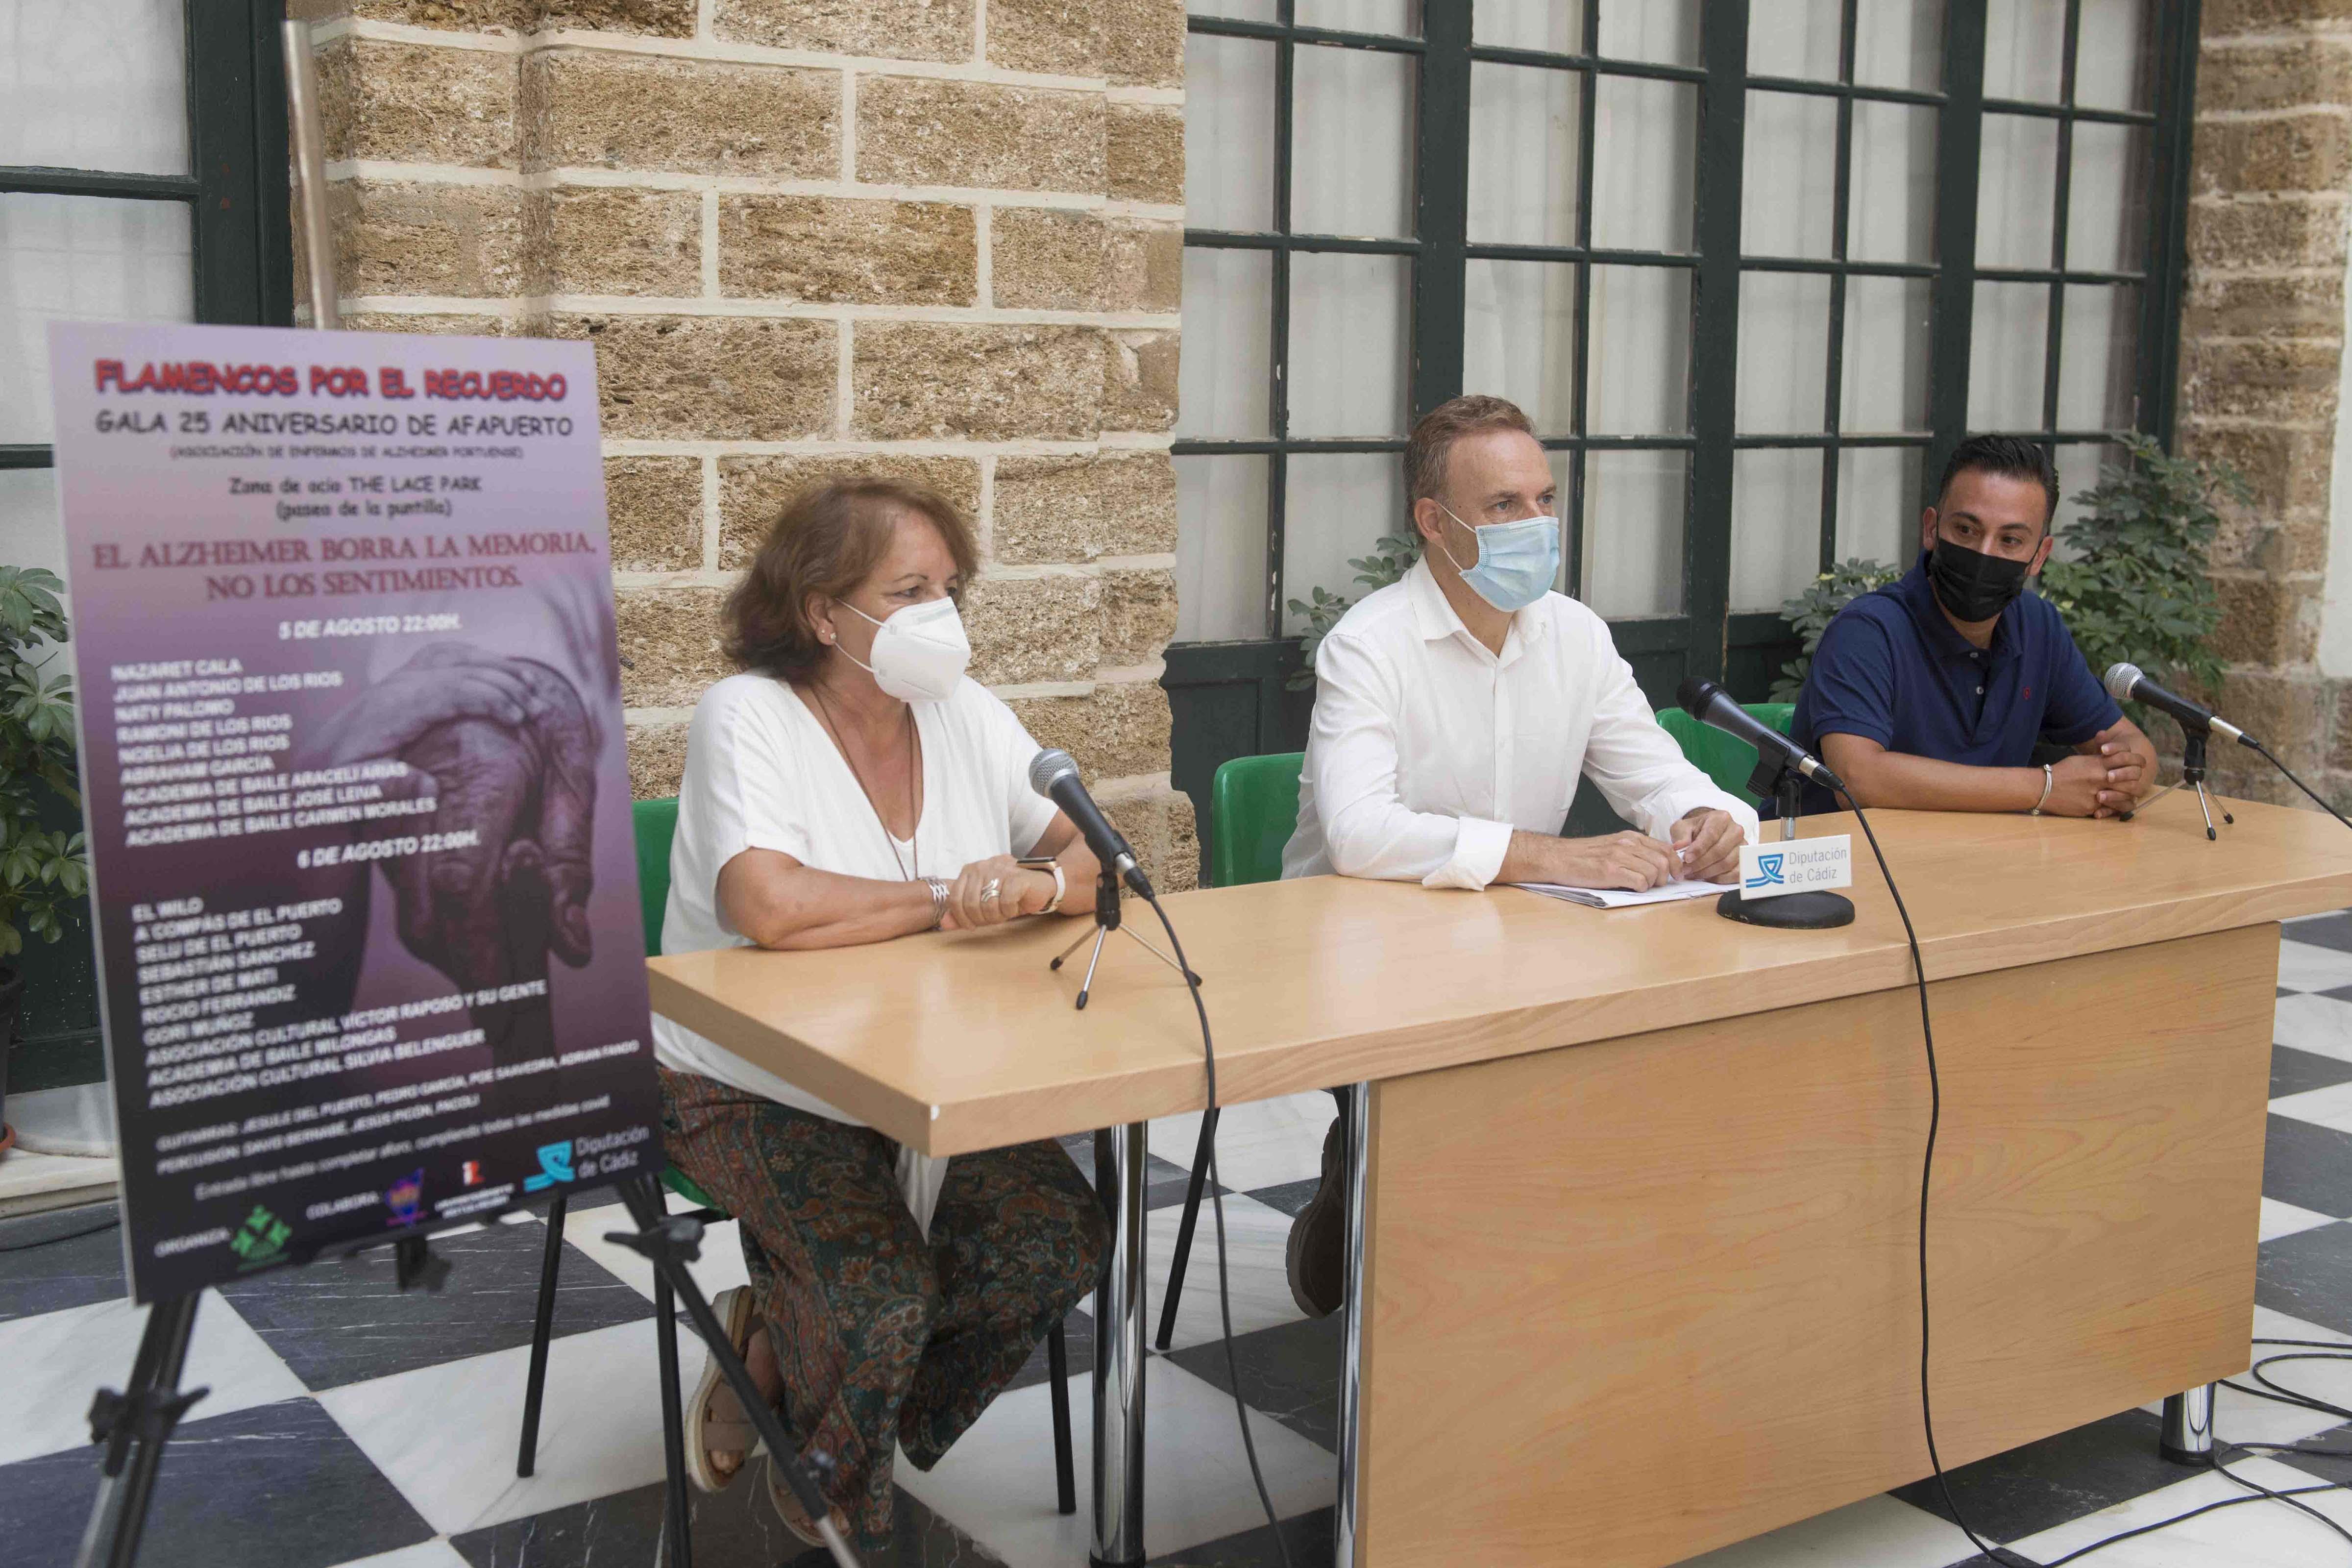 AFA Puerto celebra su 25 aniversario con dos veladas flamencas